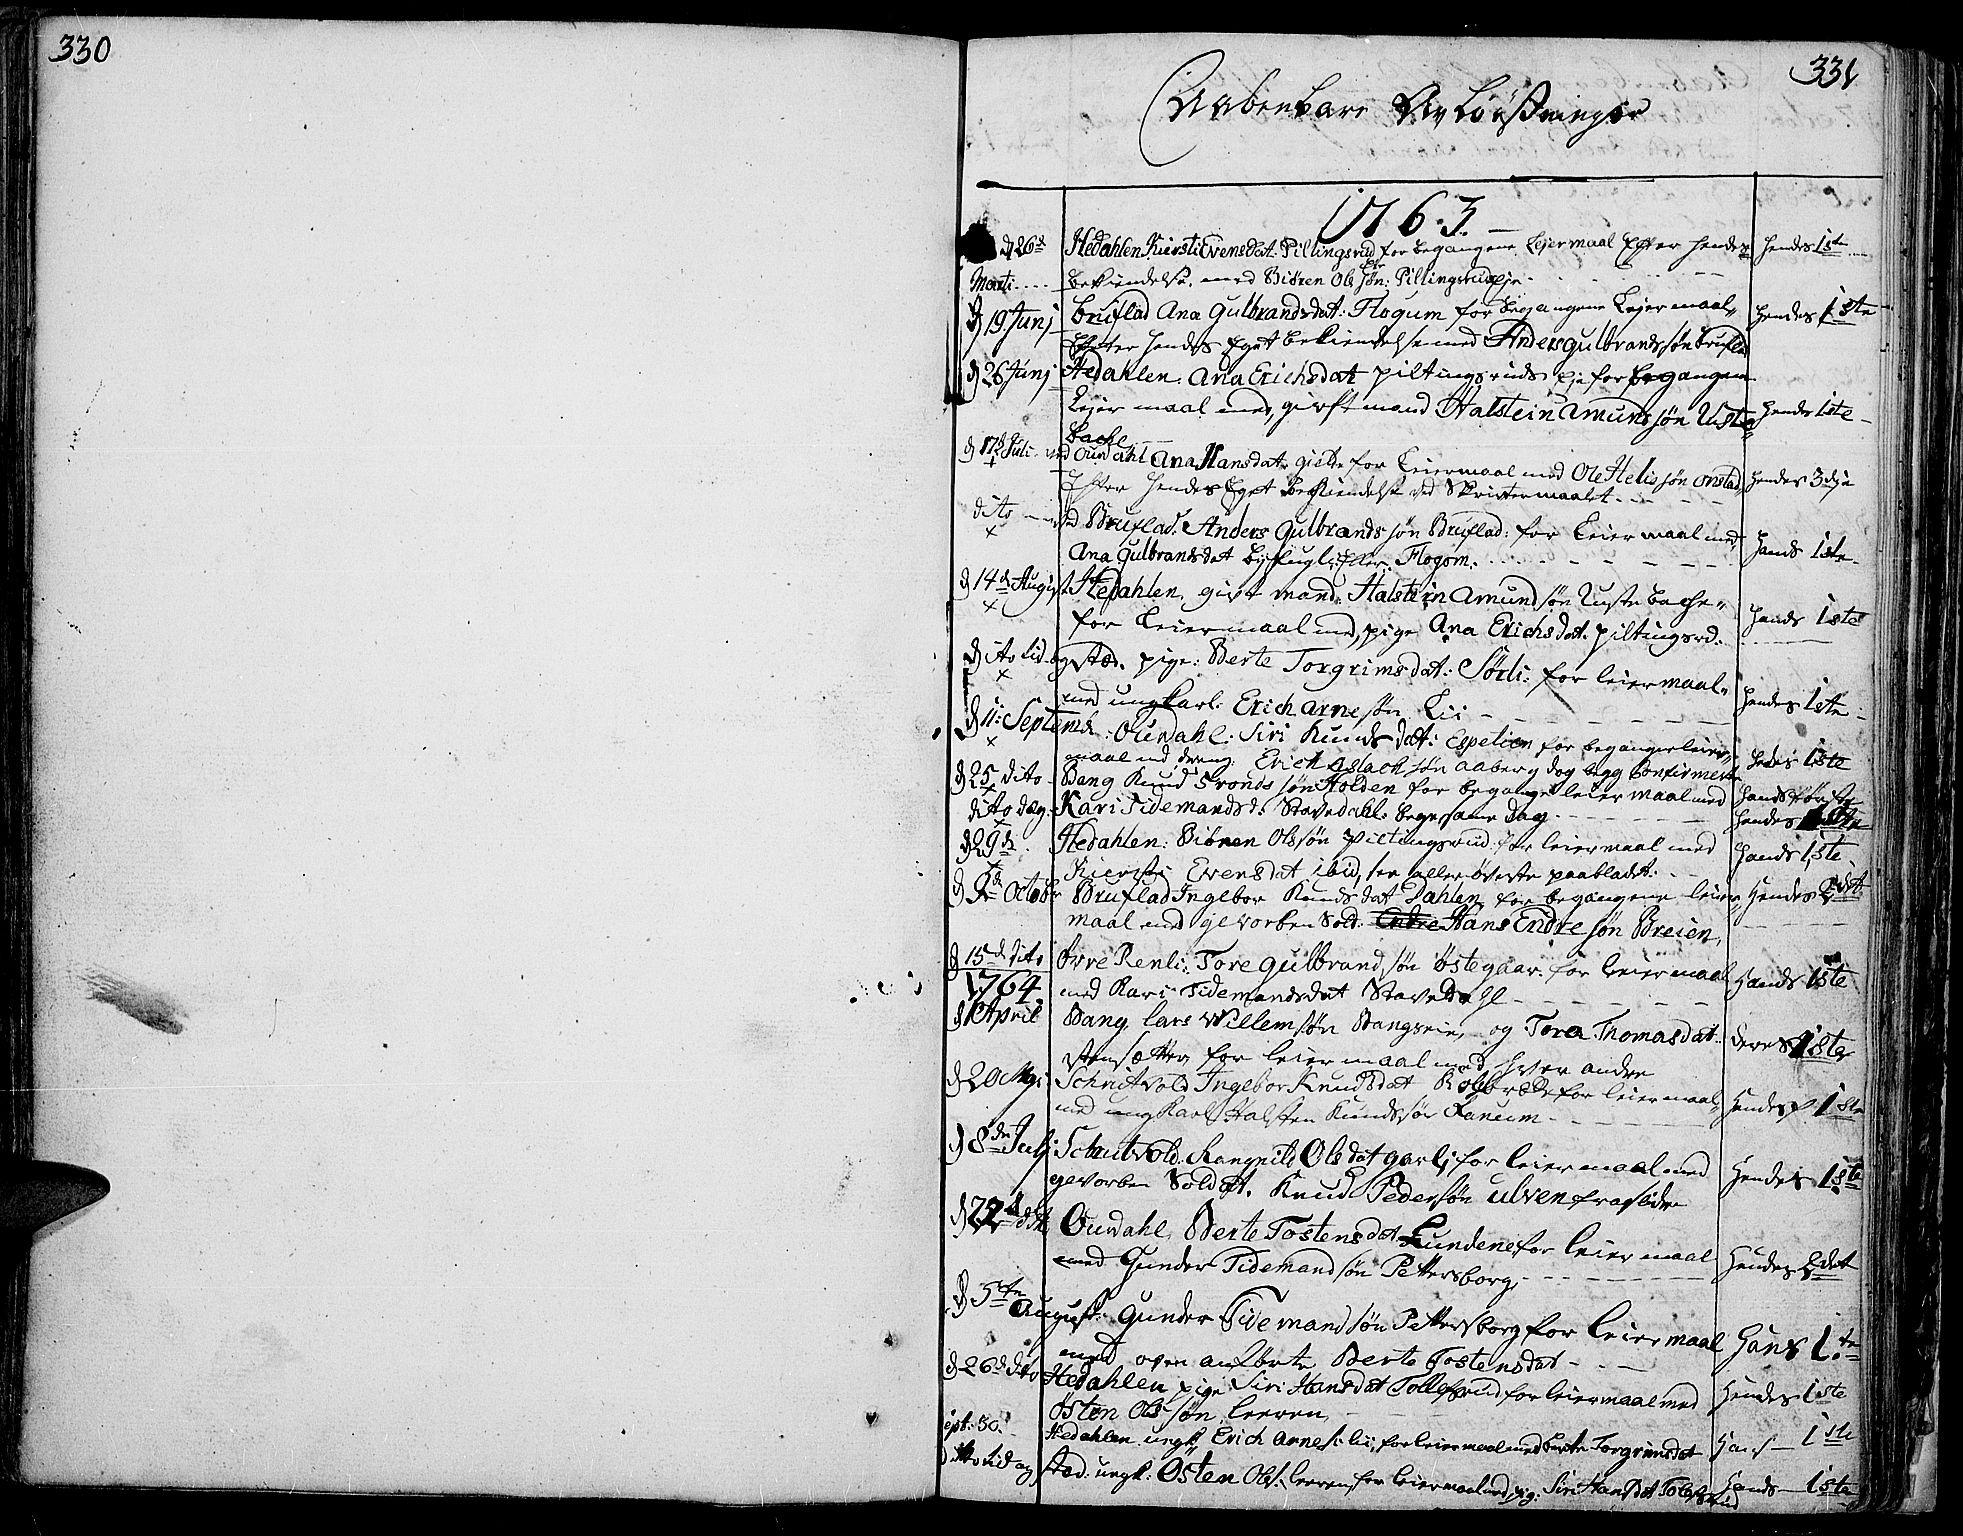 SAH, Aurdal prestekontor, Ministerialbok nr. 5, 1763-1781, s. 330-331